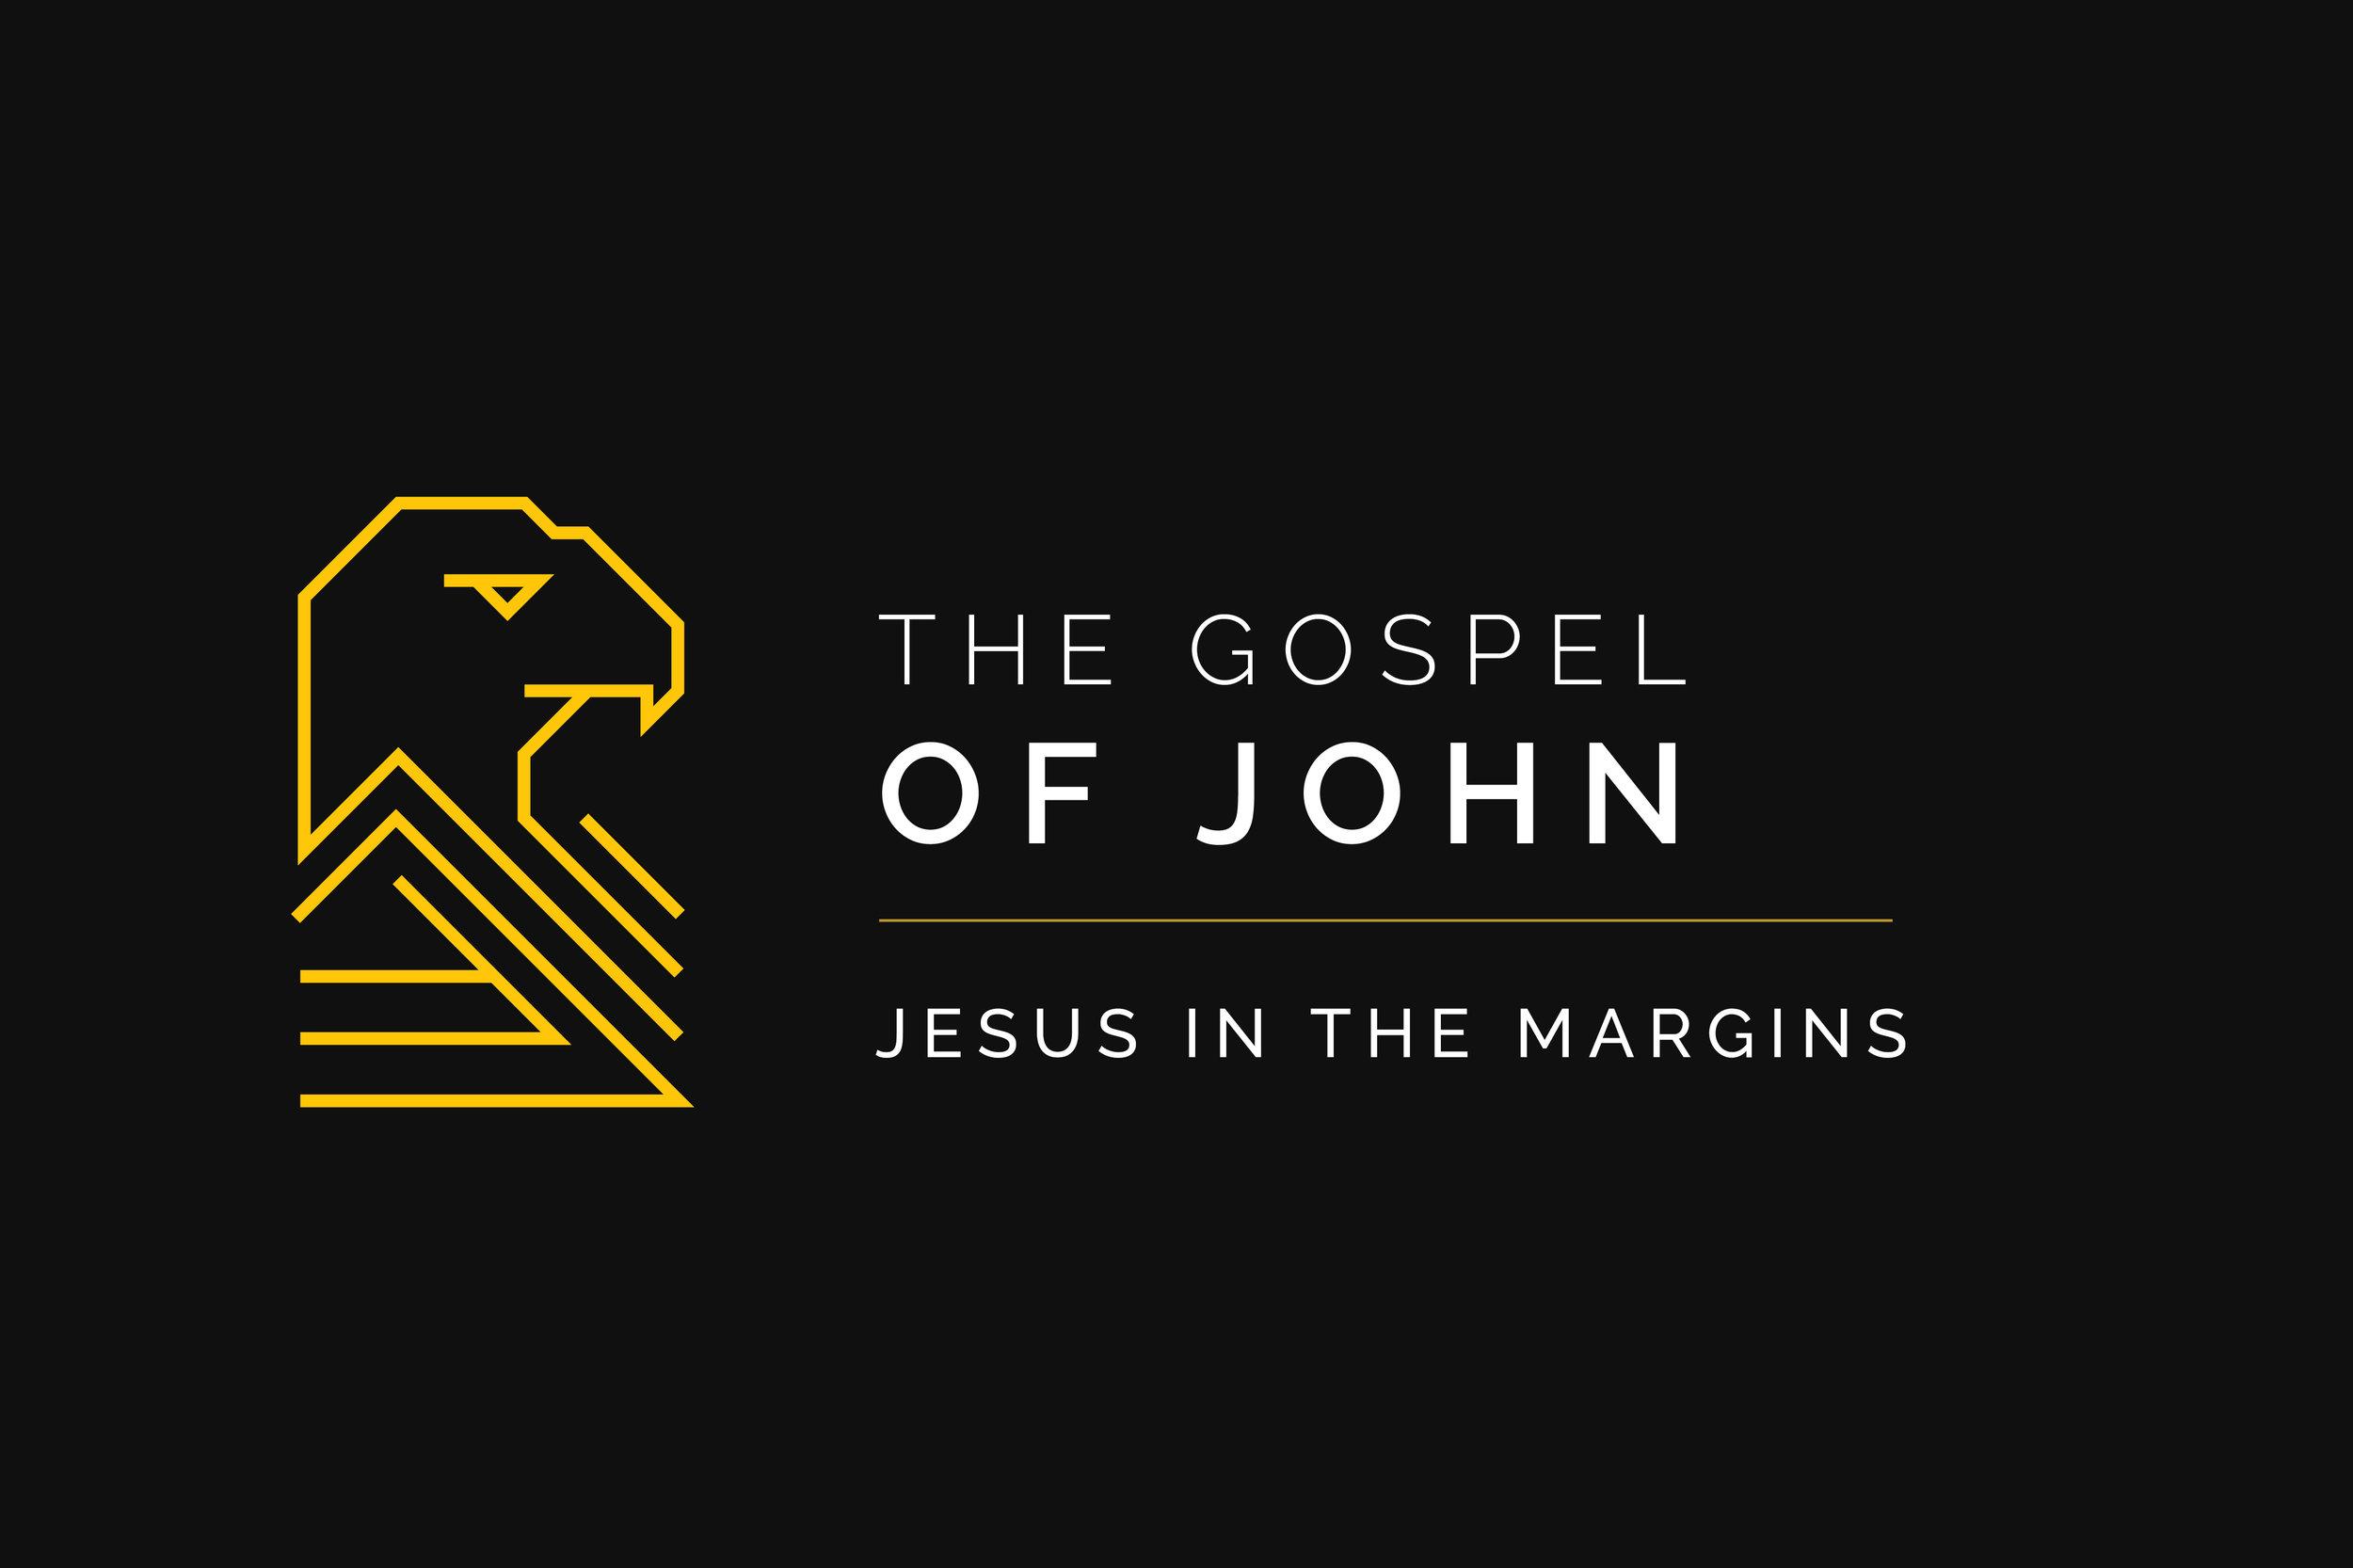 06 The-Gospel-of-John--Jesus-in-the-margins.jpg